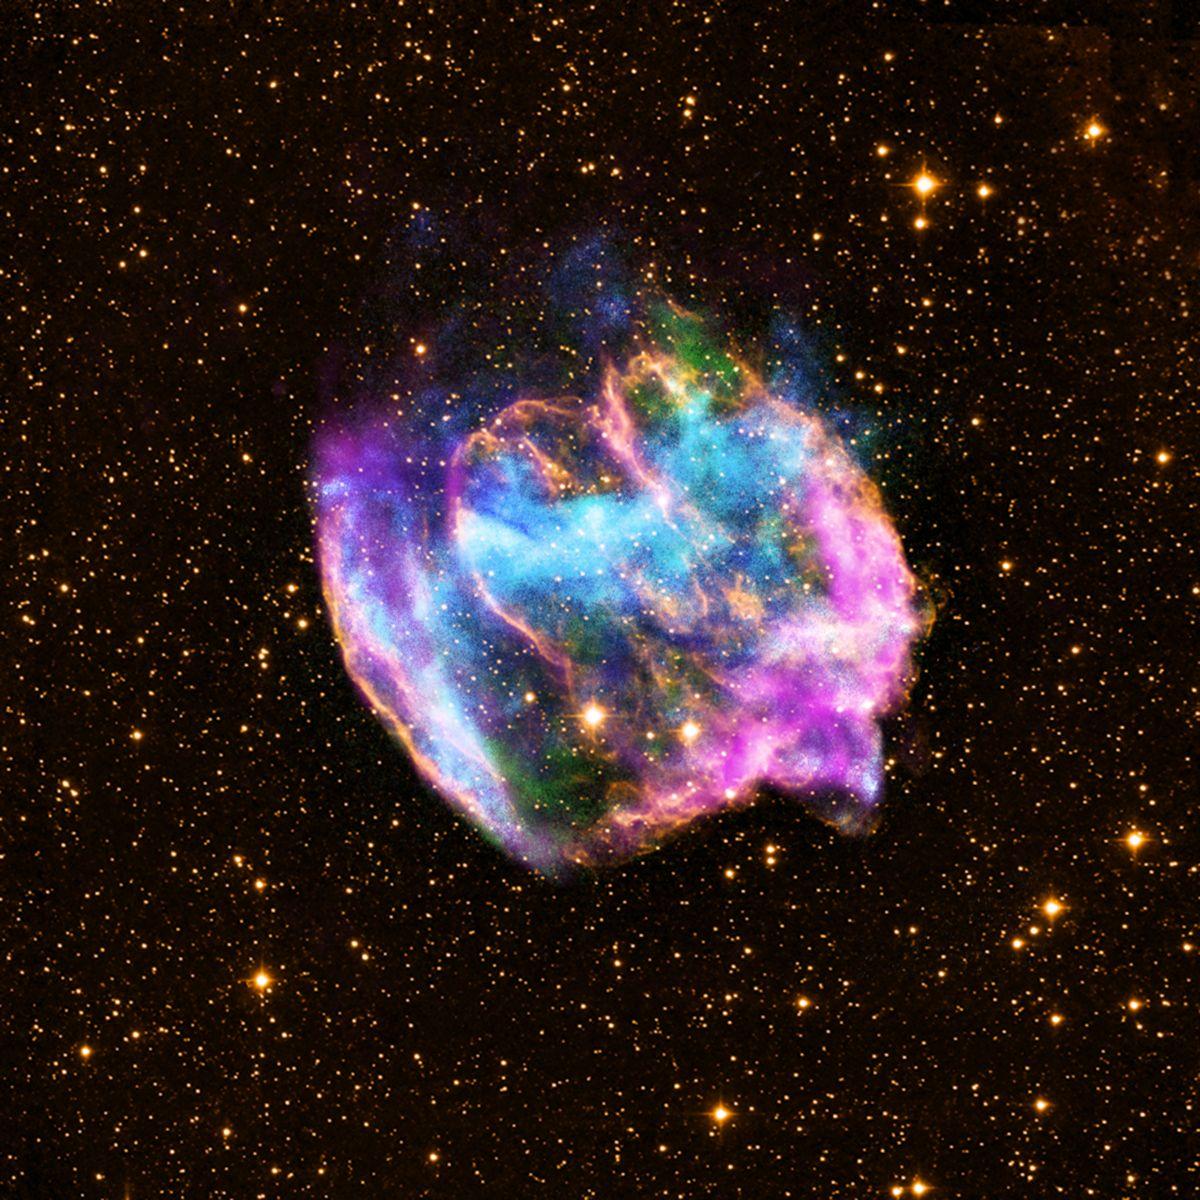 New Simulations Explore Supernova Explosions and Universe Evolution (Video)